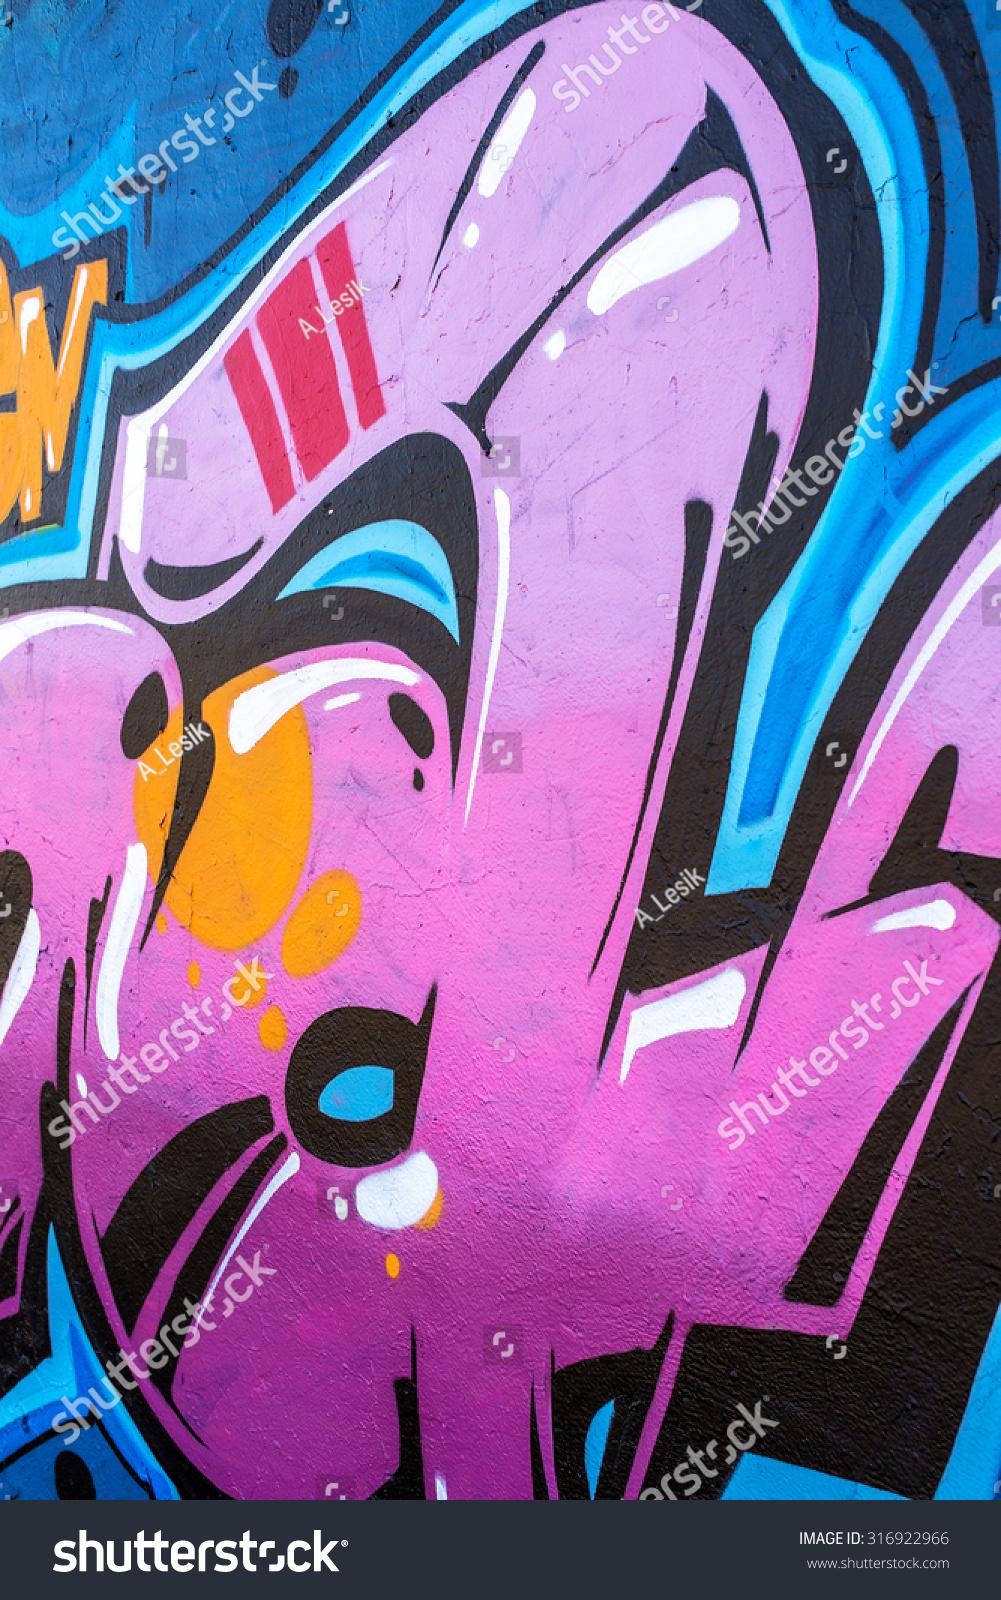 Beautiful Street Art Graffiti Abstract Color Stock Photo (Edit Now ...